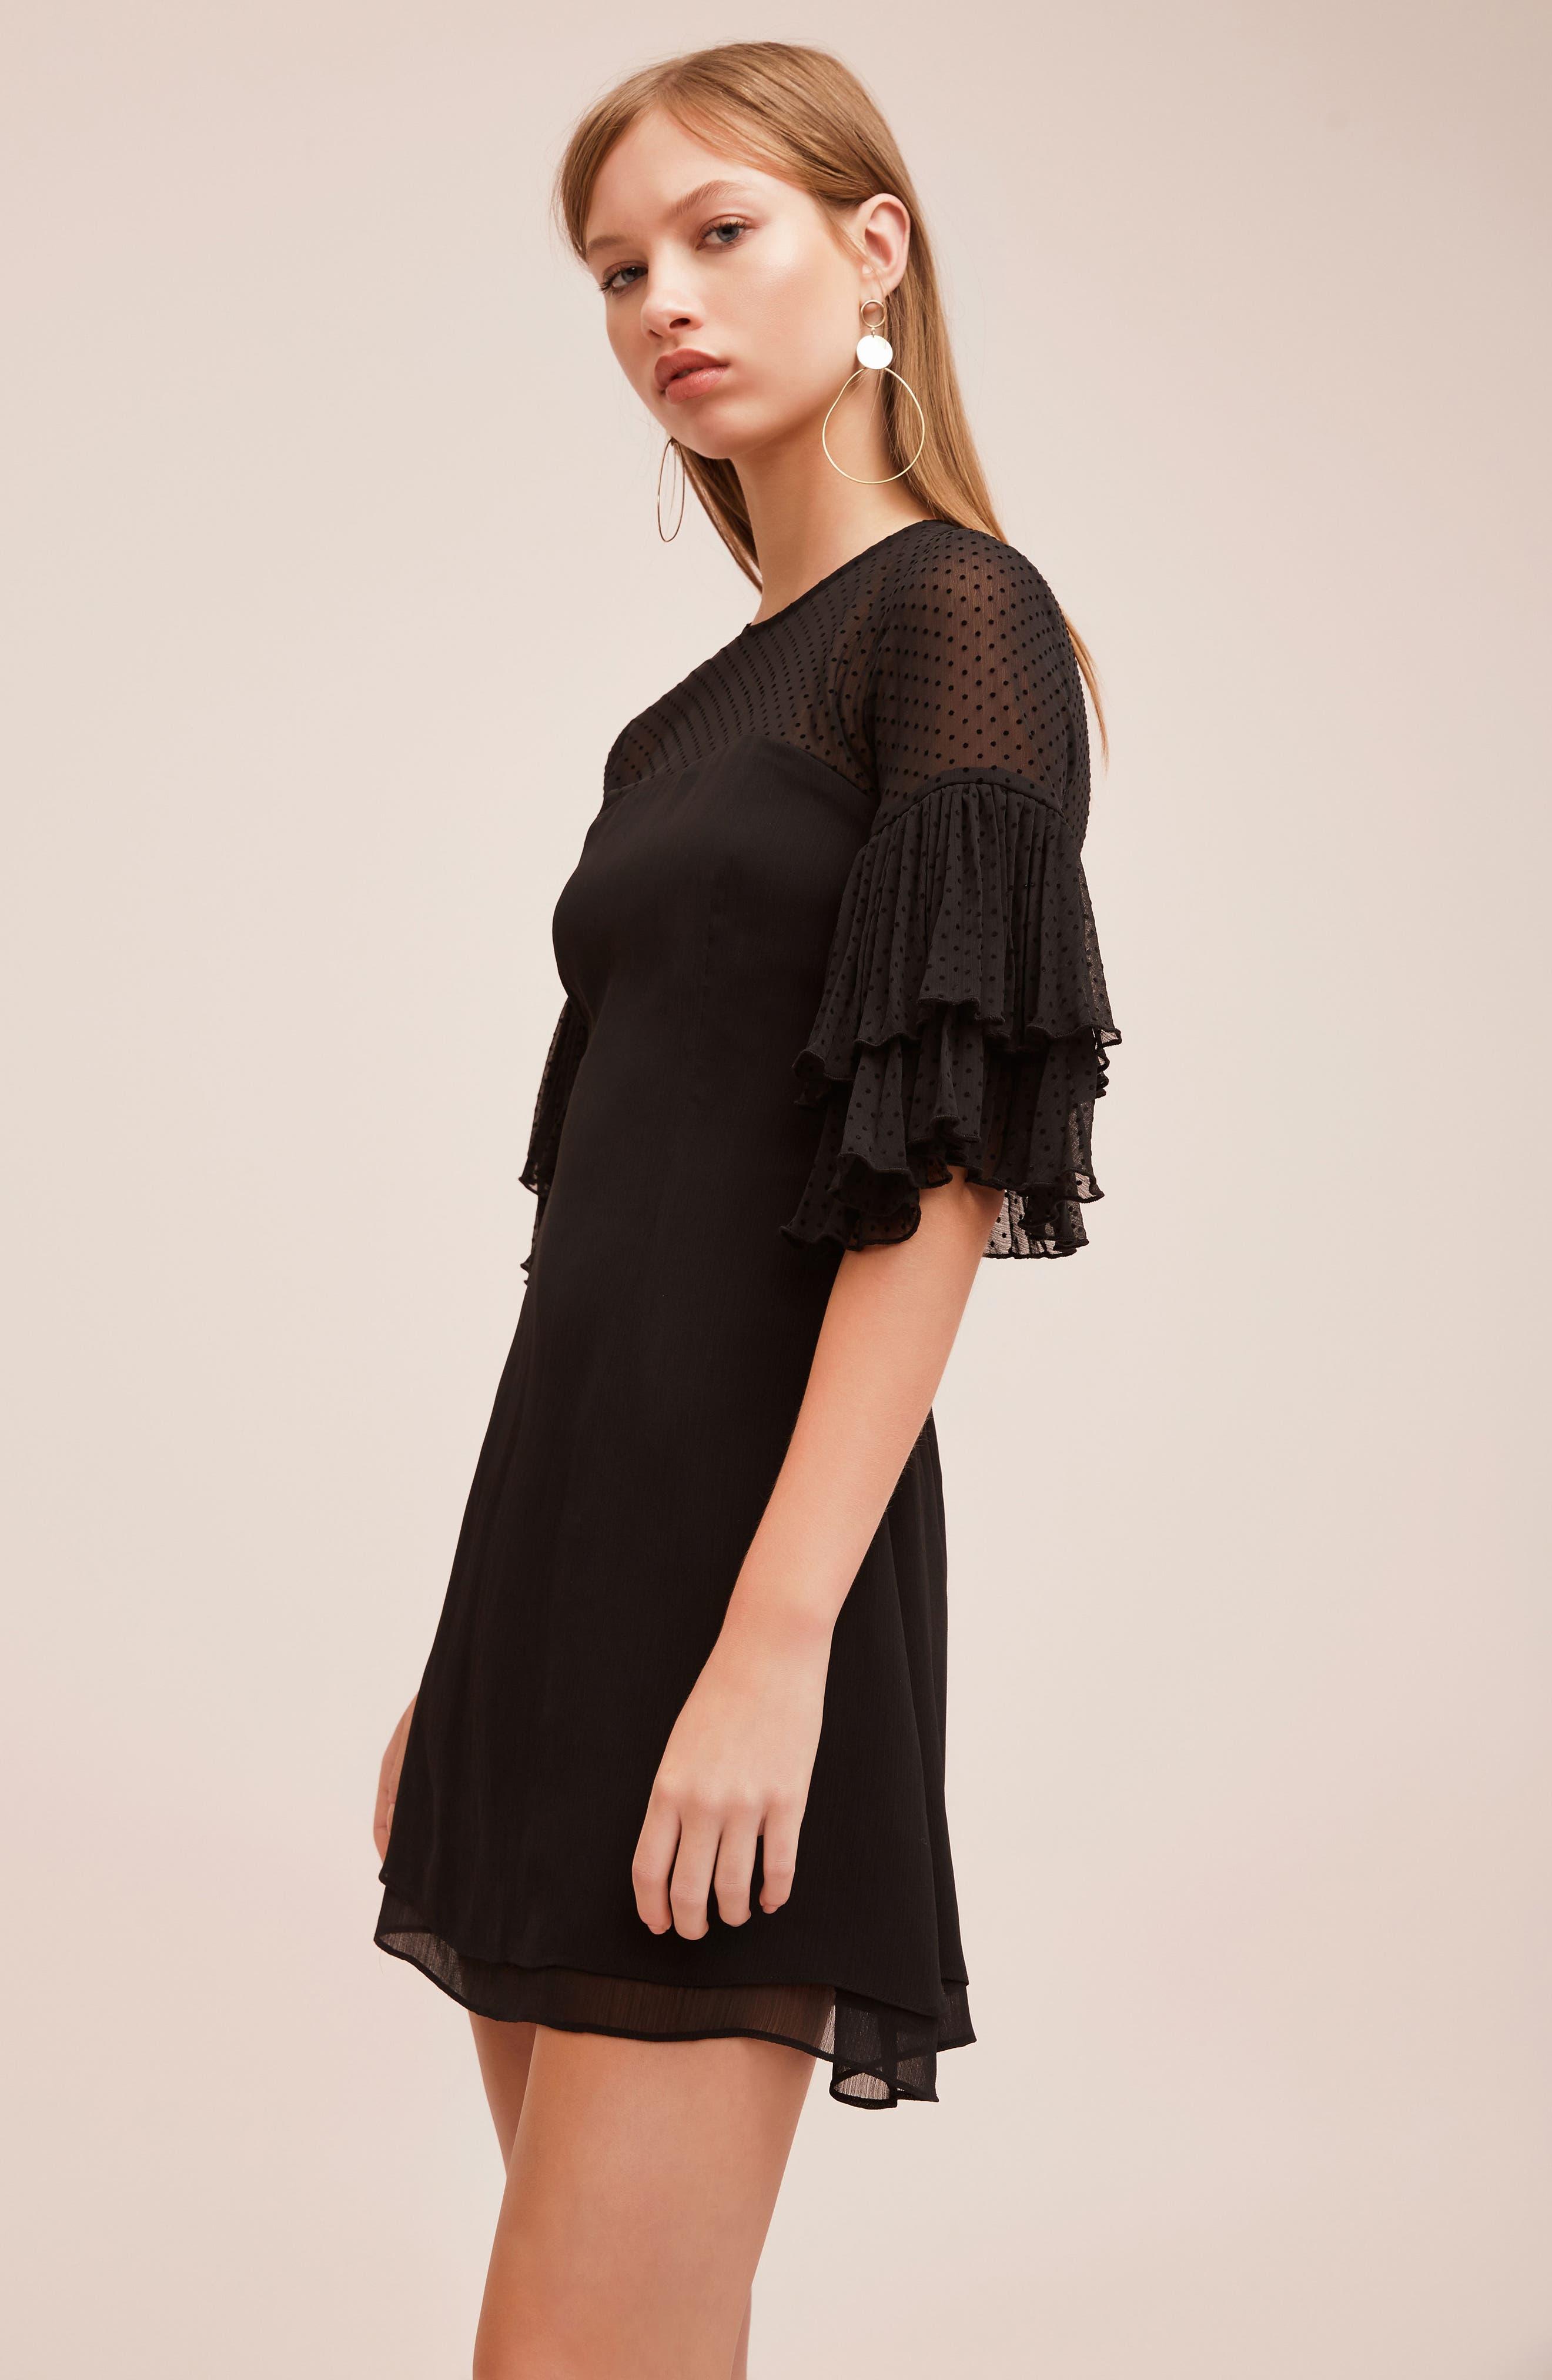 Horizons Bell Sleeve Minidress,                             Alternate thumbnail 2, color,                             Black